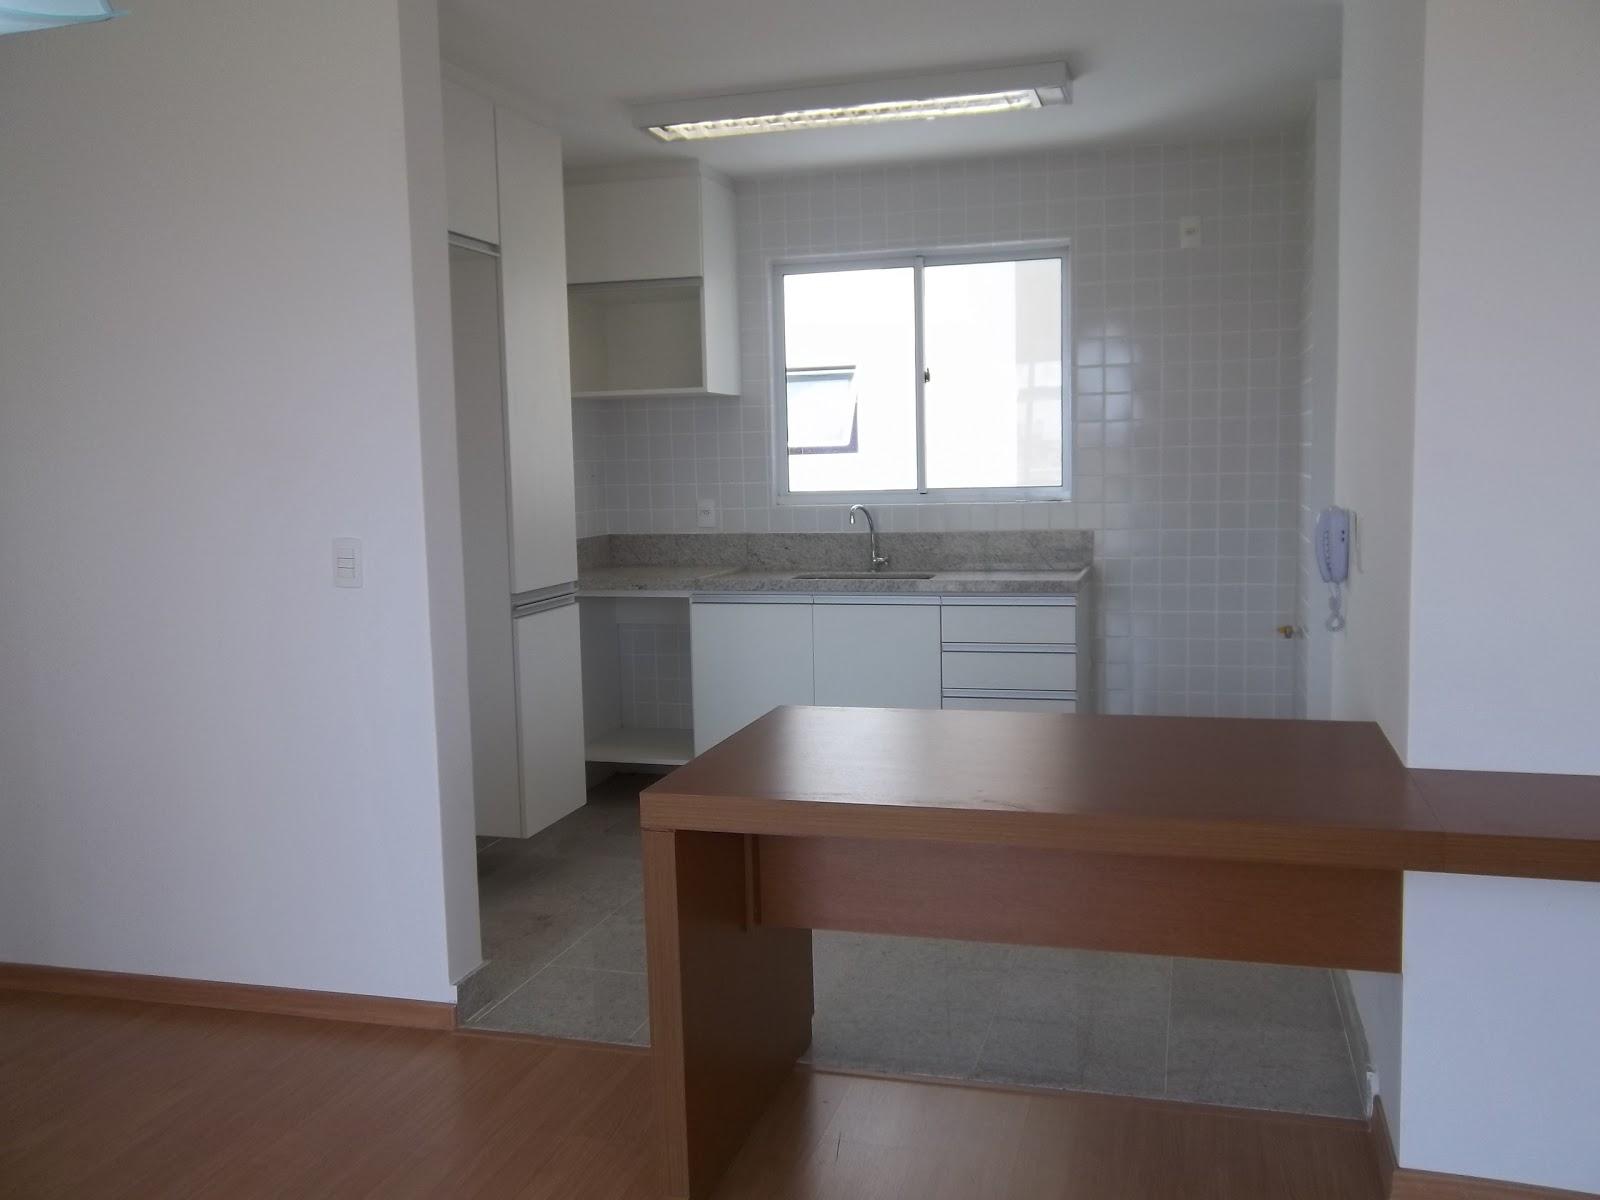 Apartamentos no Cond. Sirius Pq. Prado #483830 1600 1200